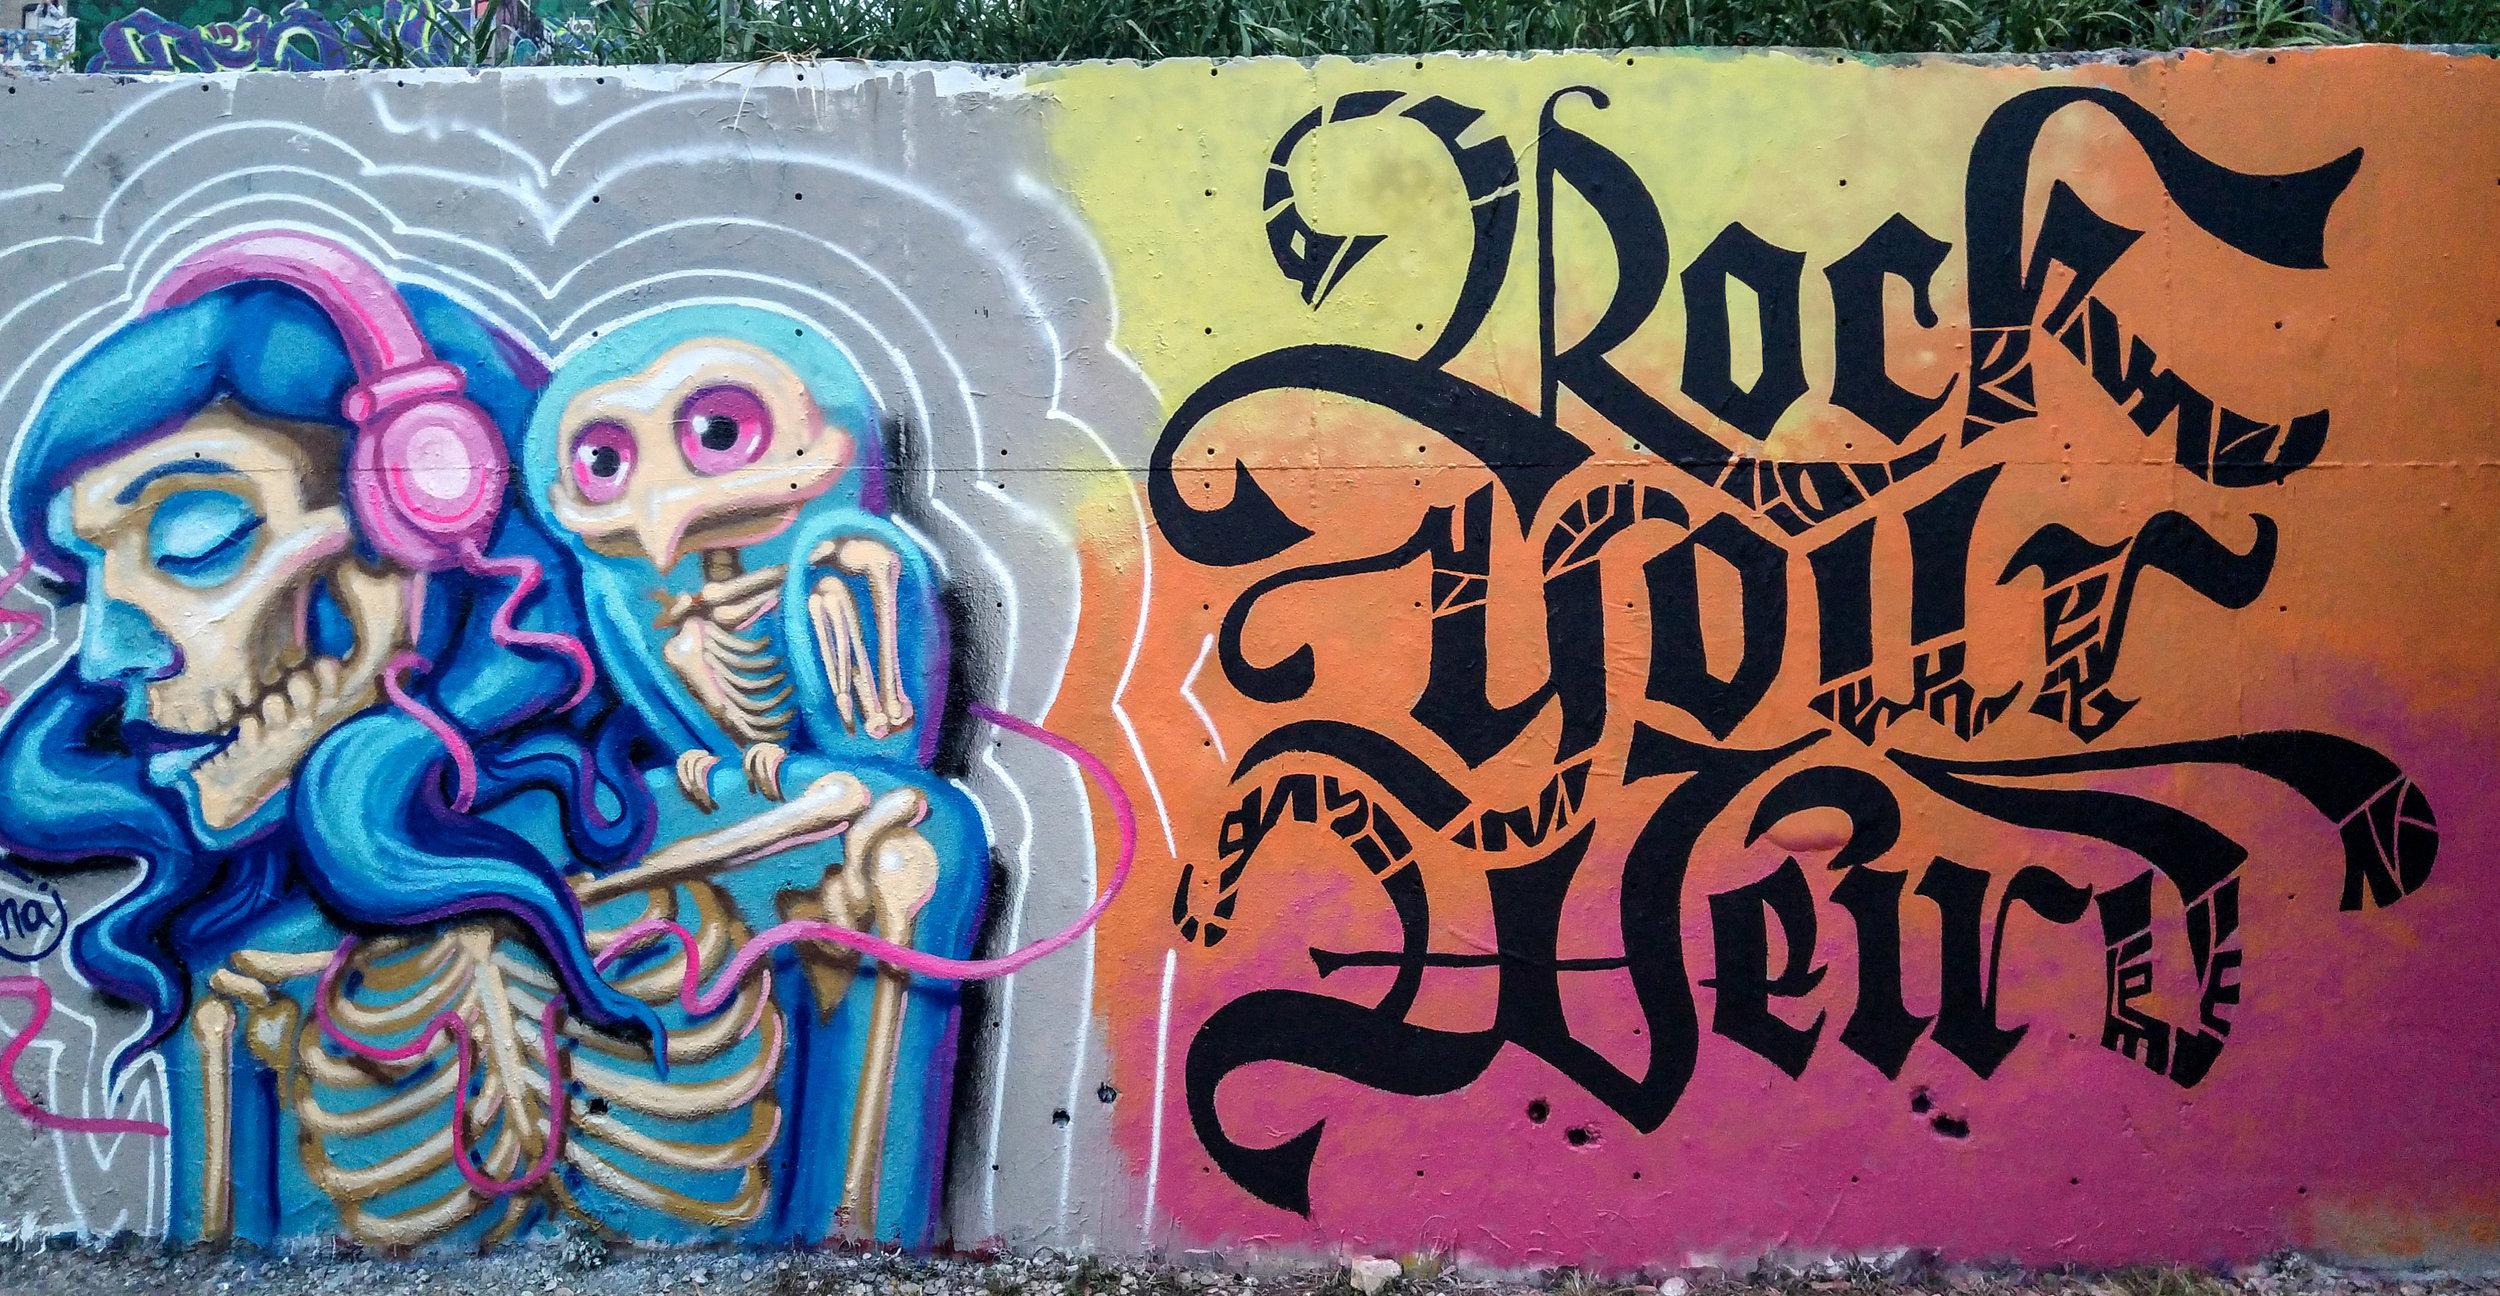 Kate Hursthouse Mural // Rock Your Weird // Austin, Texas